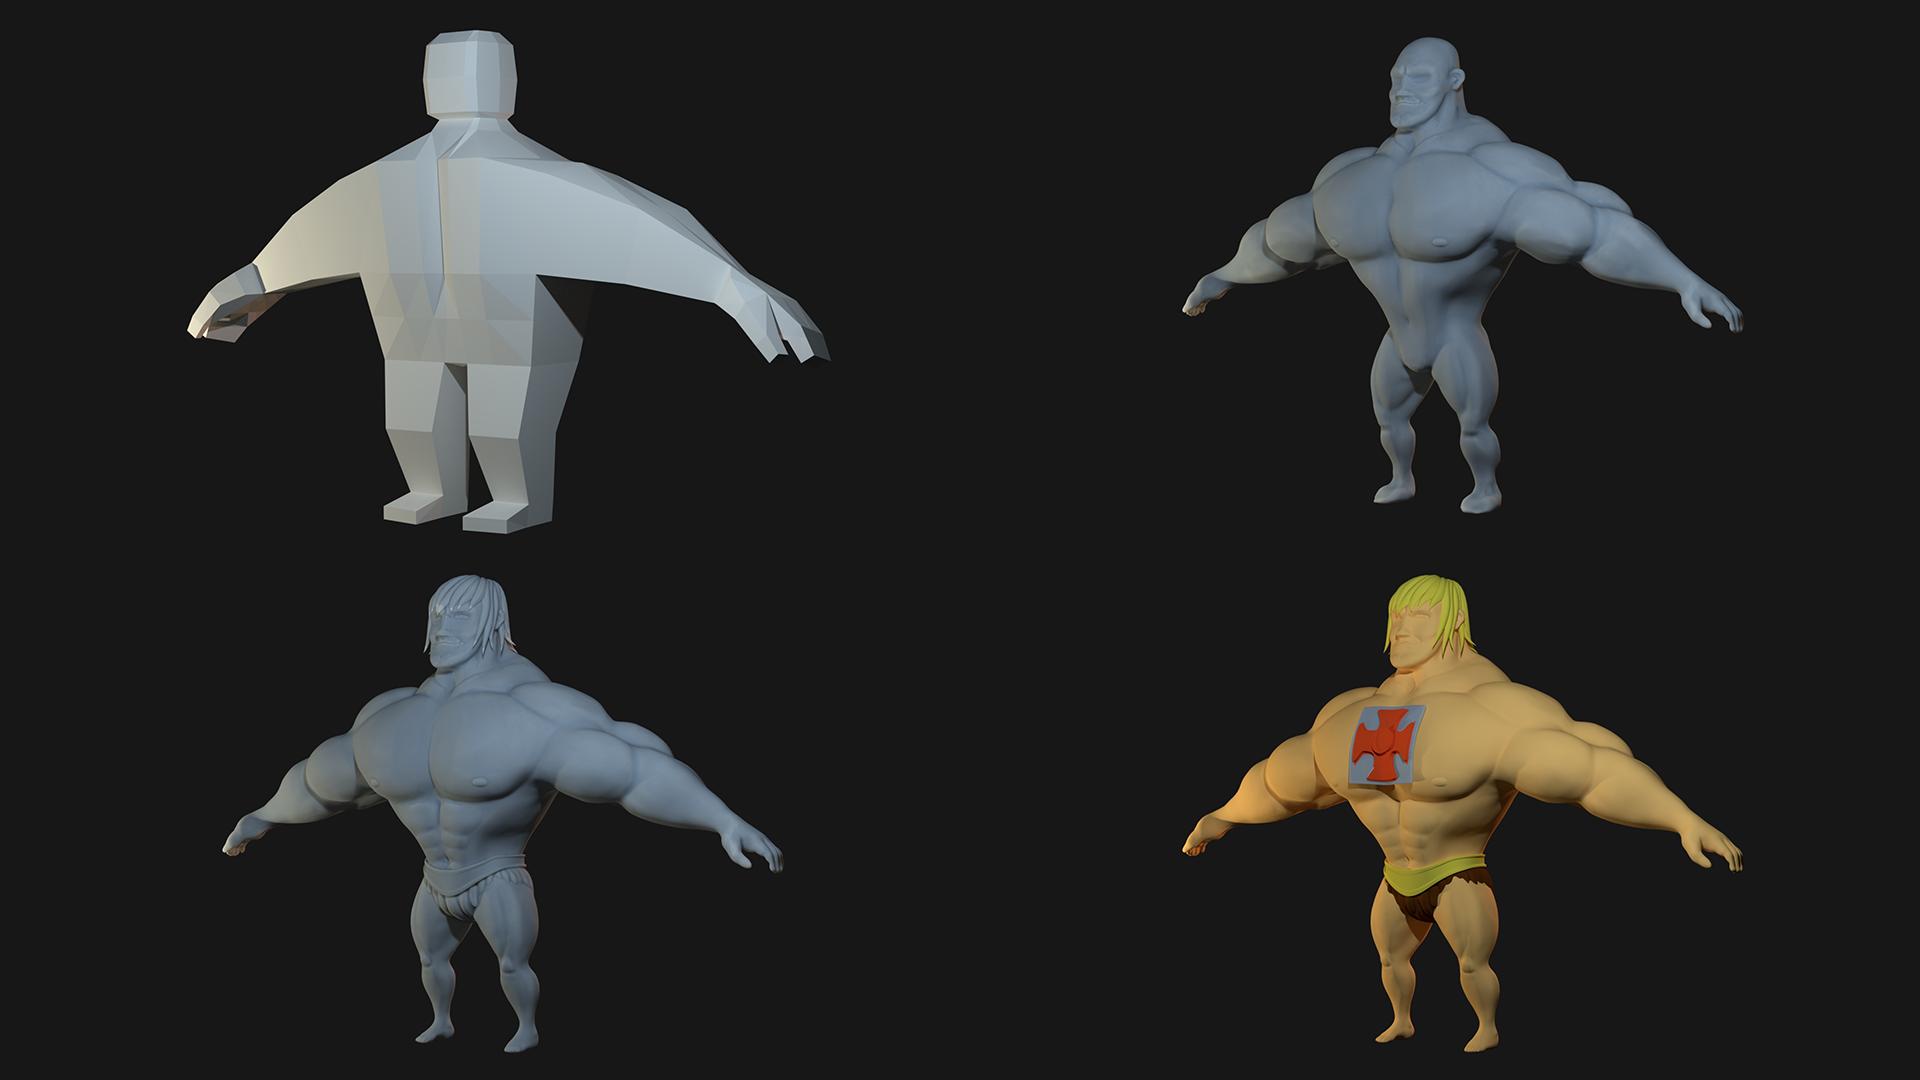 He-Man-progress.png